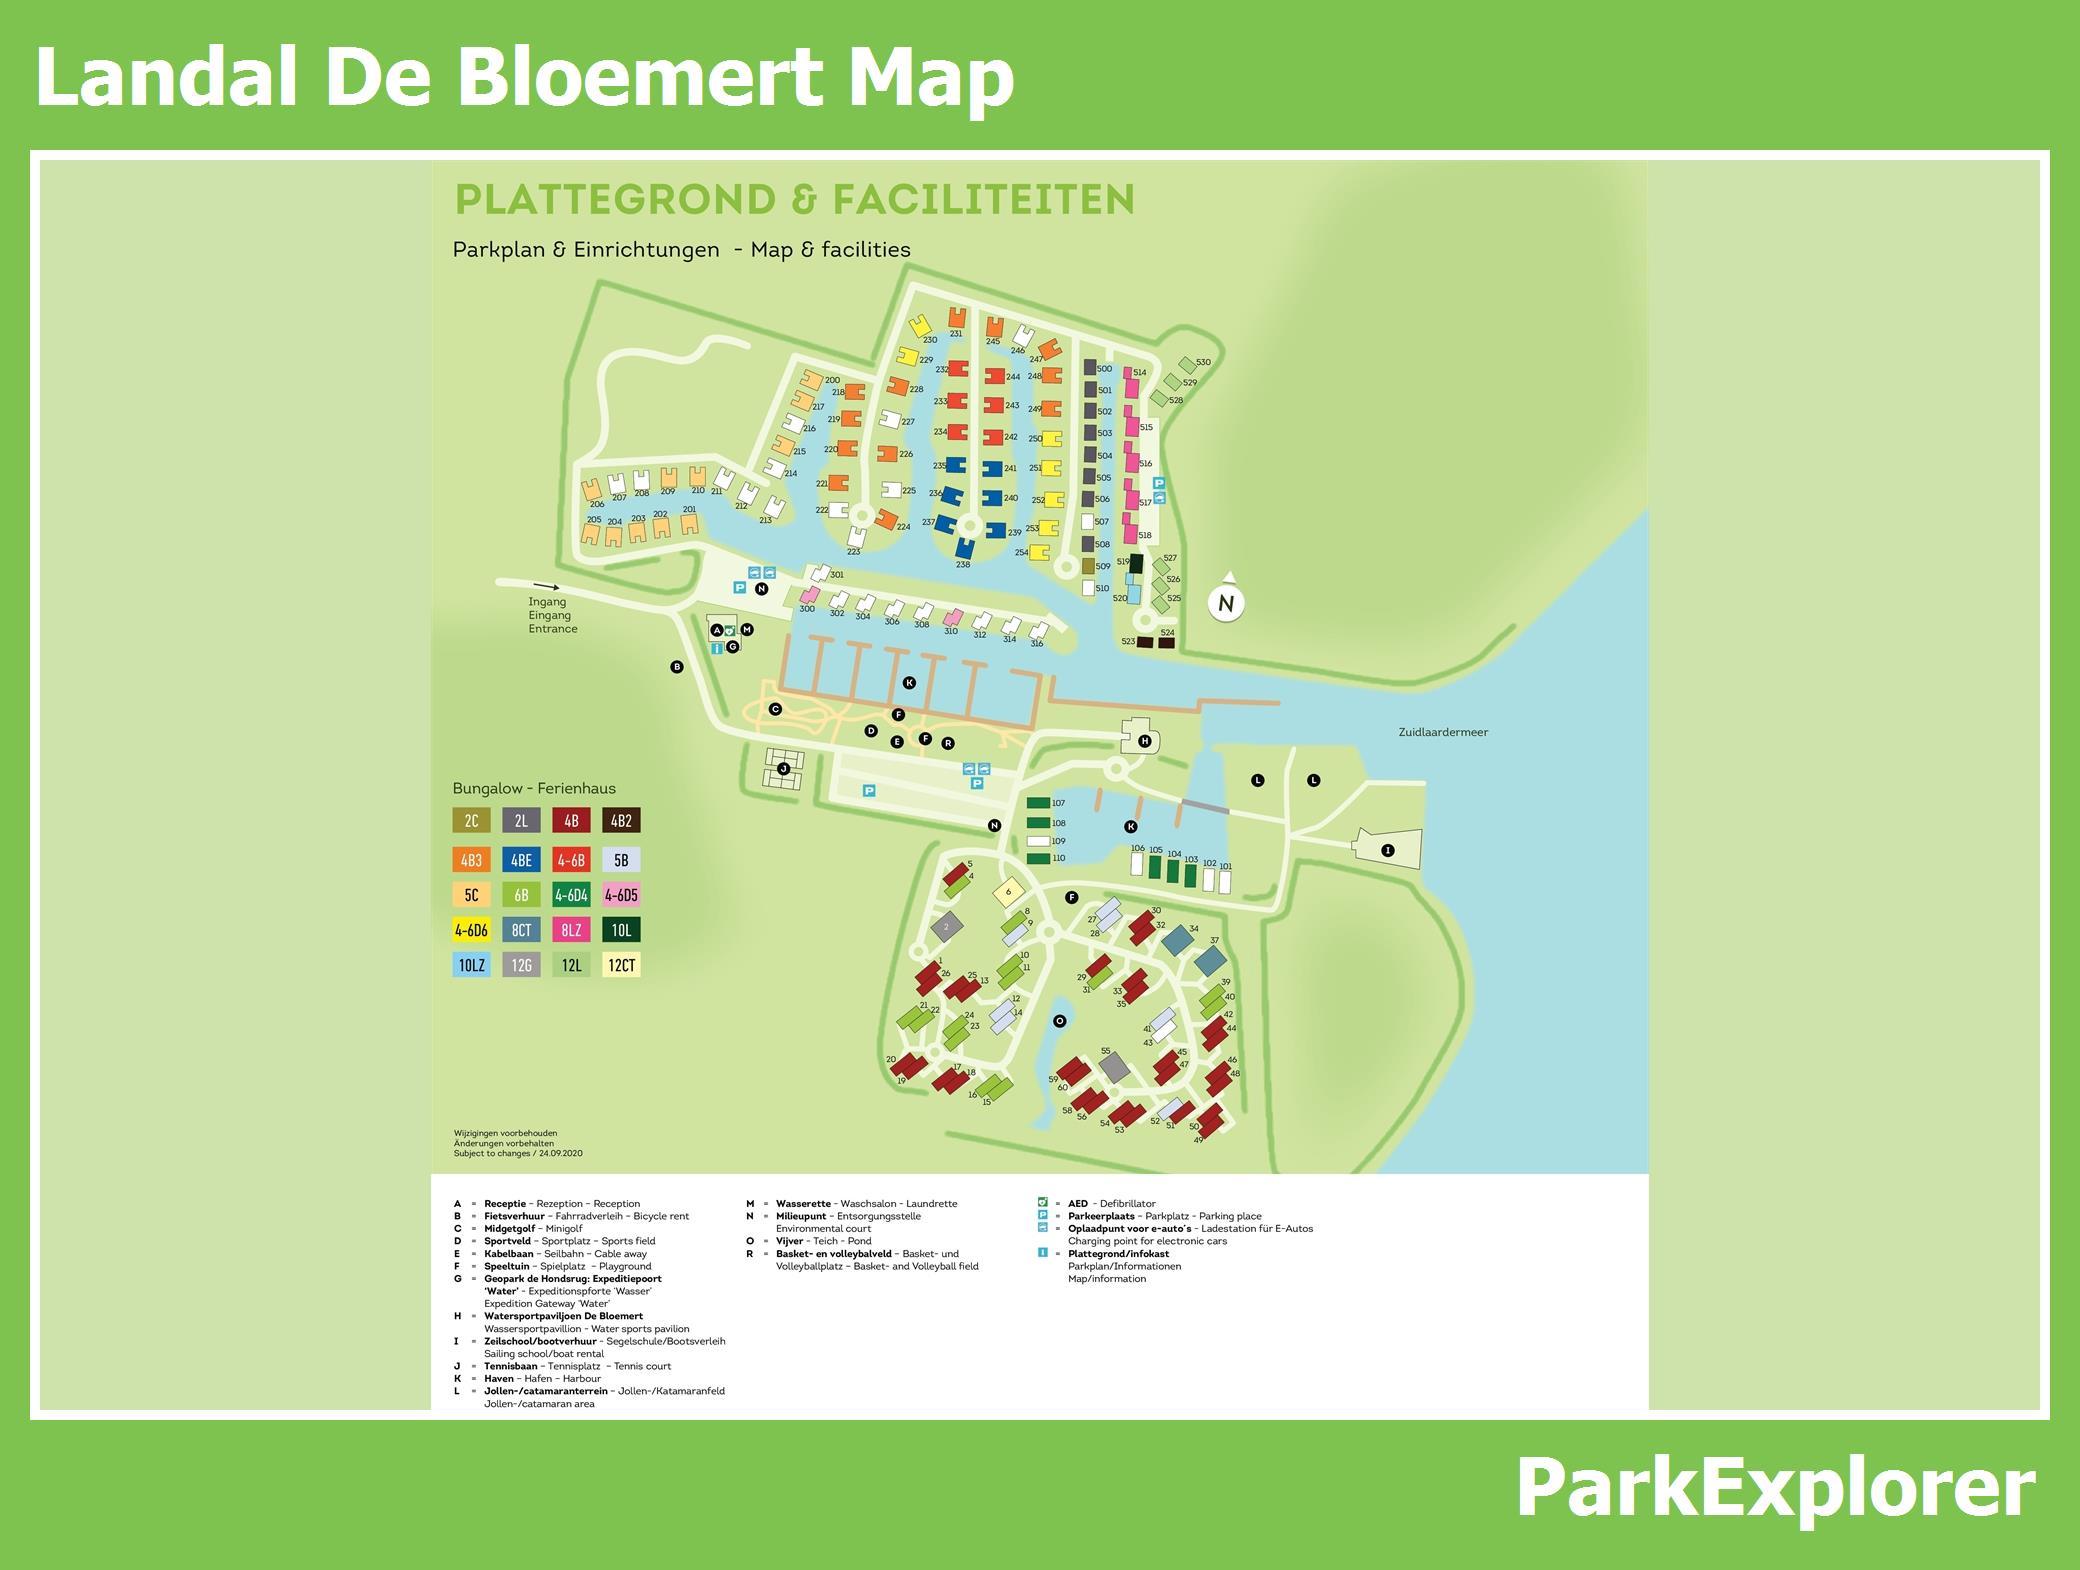 Px Village Map Of Landal De Bloemert Parkexplorercom